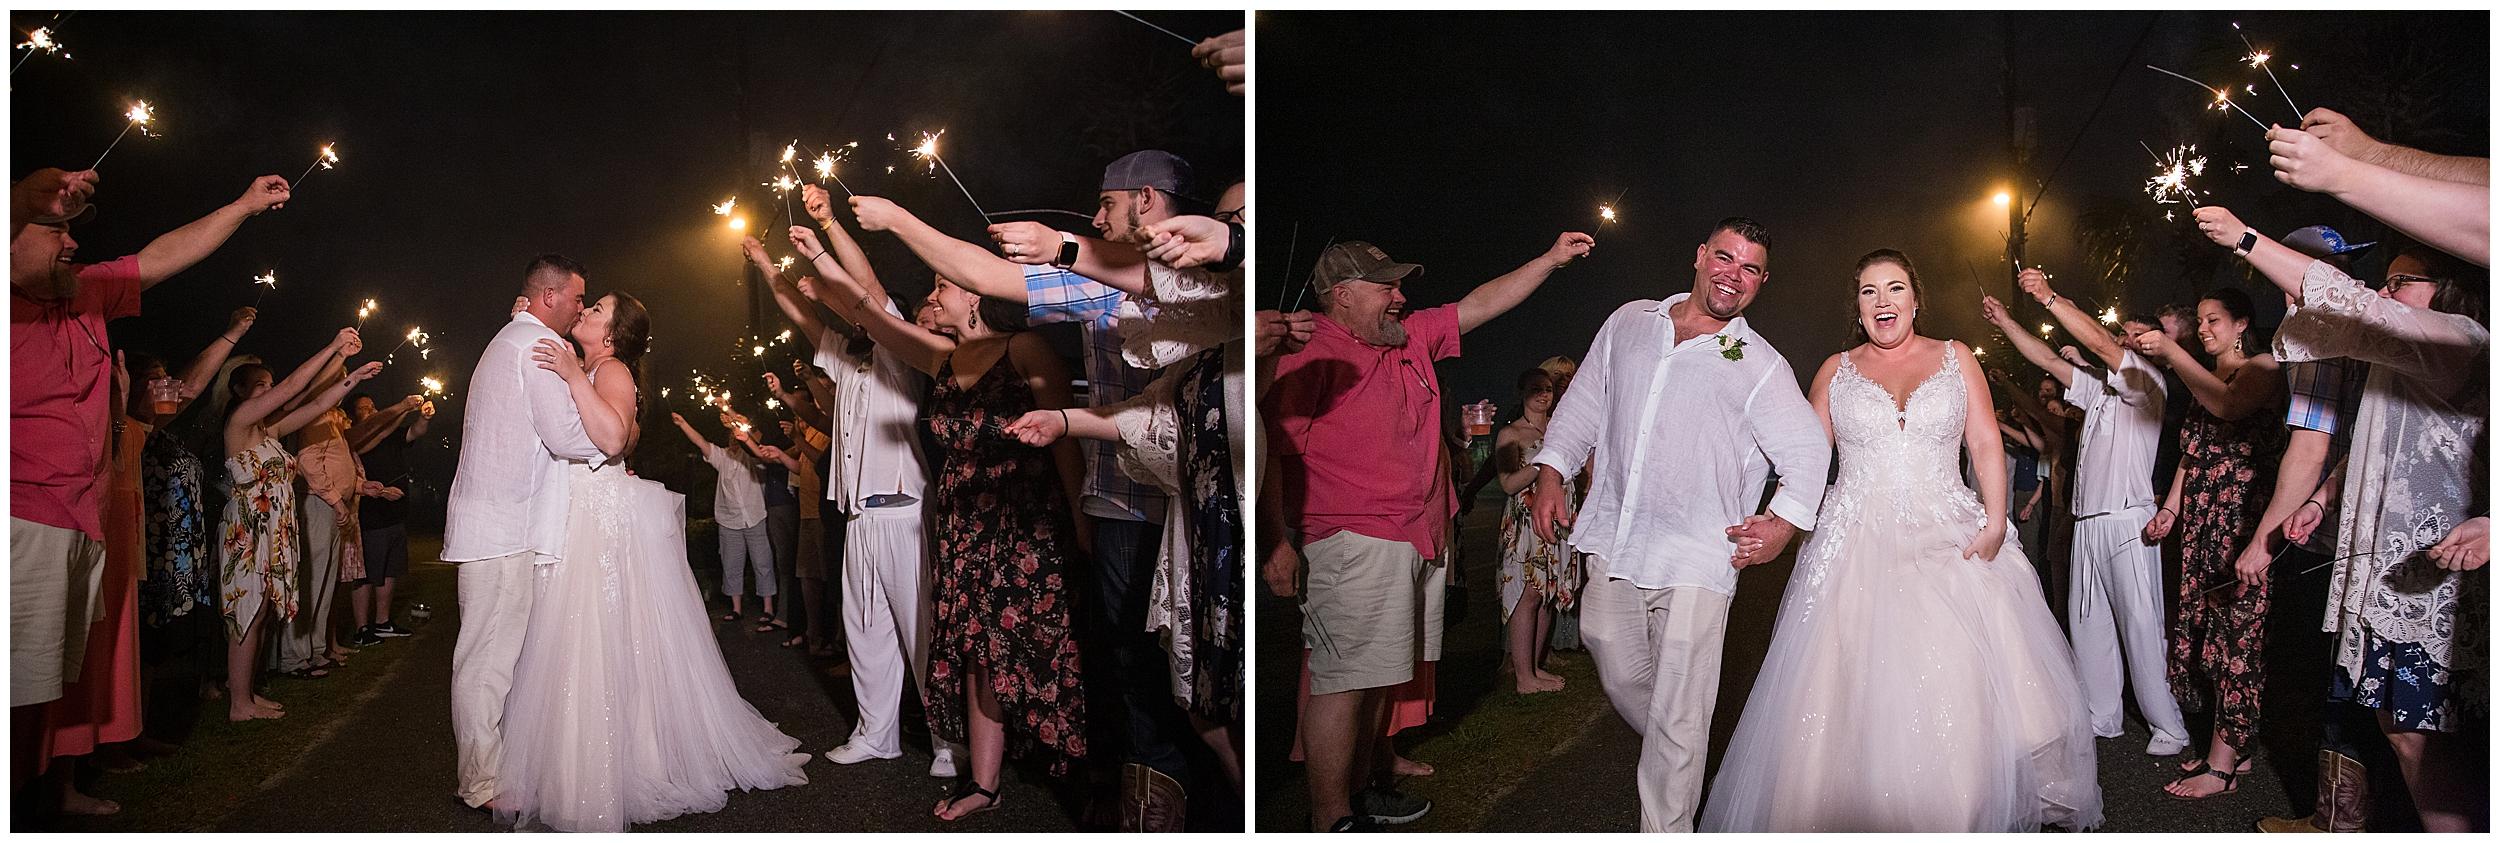 30a-Destin-Florida-Wedding-Photography-Jennie-Jeremy_0046.jpg